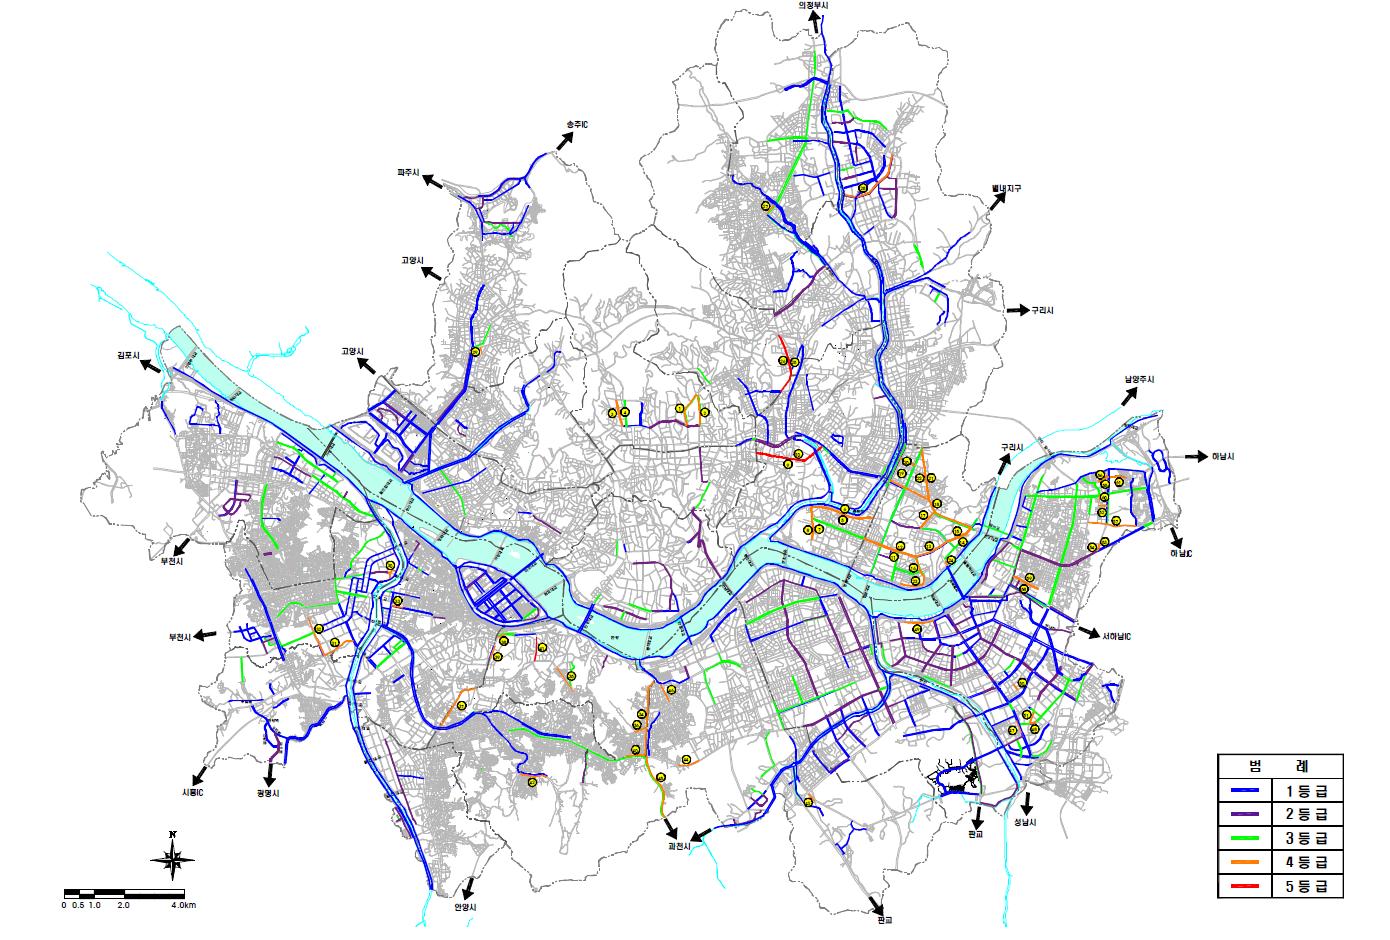 Seoul Bicycle Path Quality